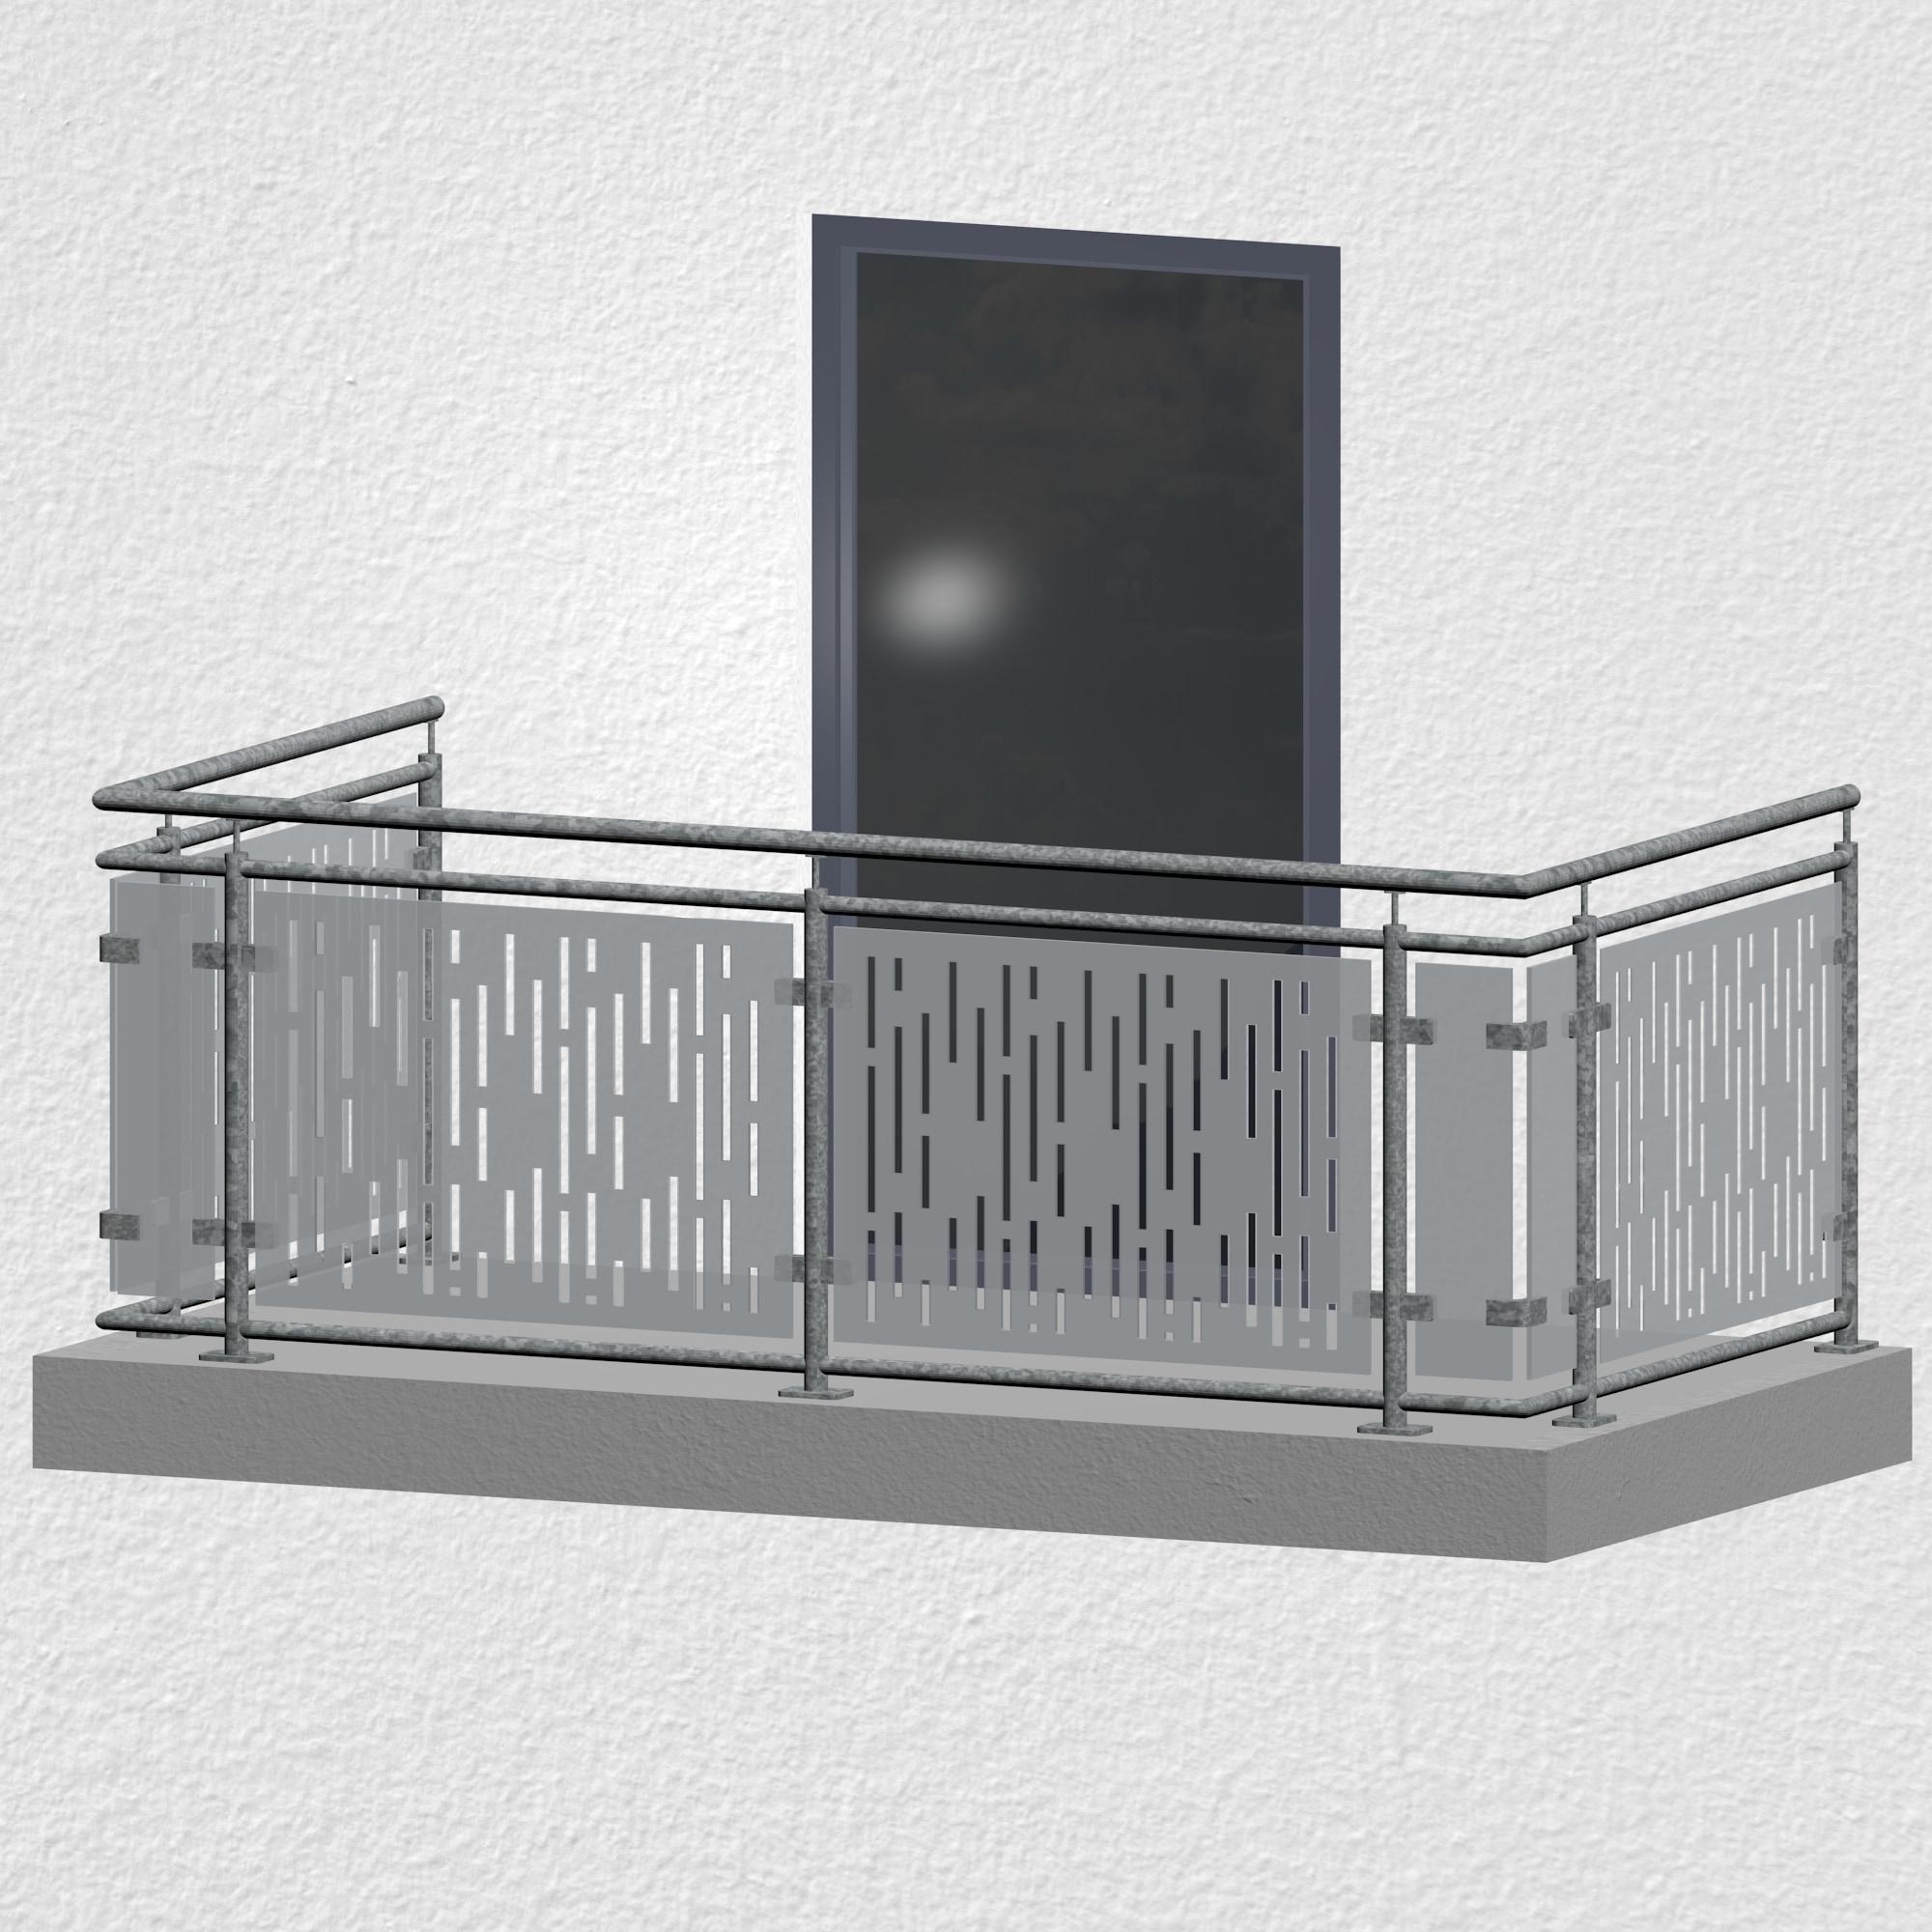 Balkongeländer verzinkt Designglas SF VE